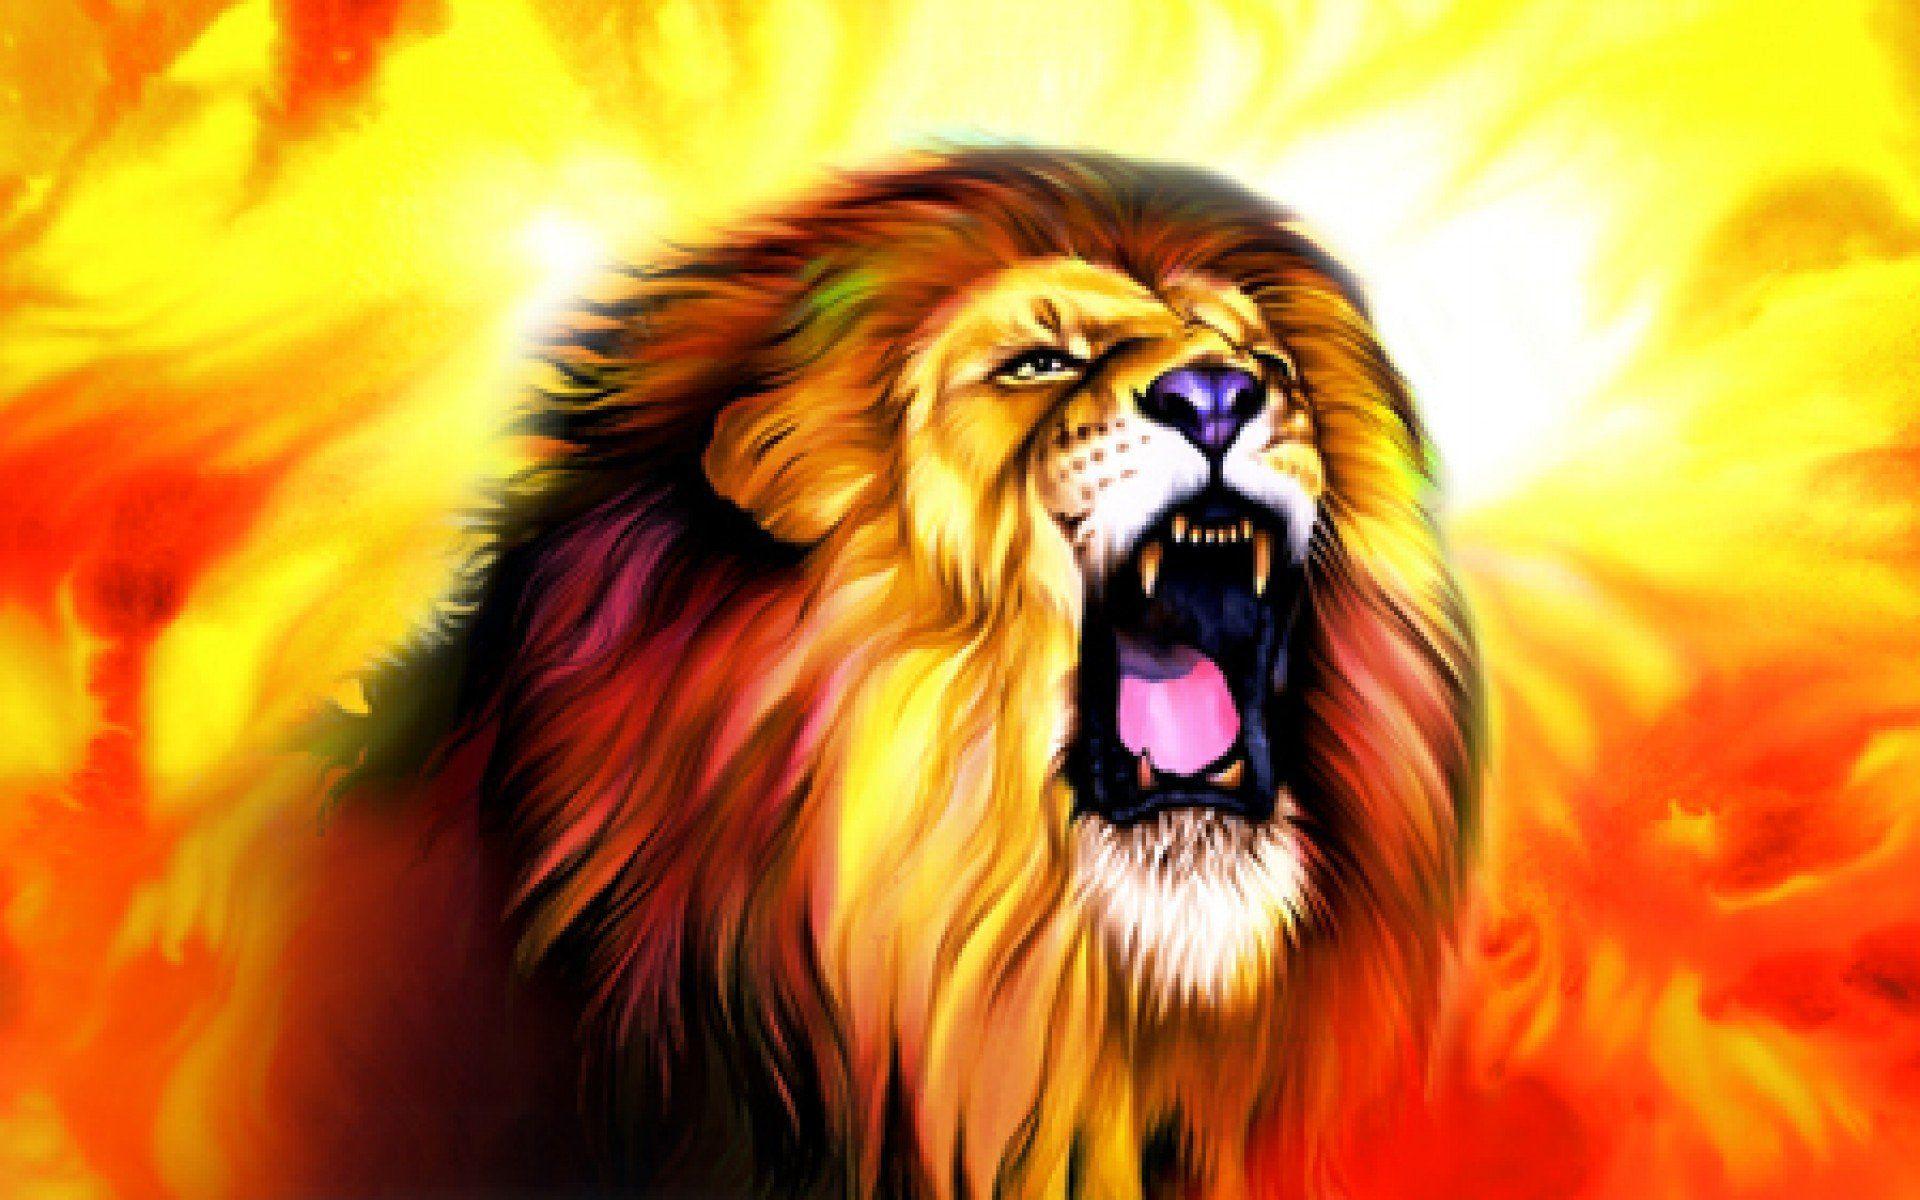 Roaring Lion Wallpapers 40